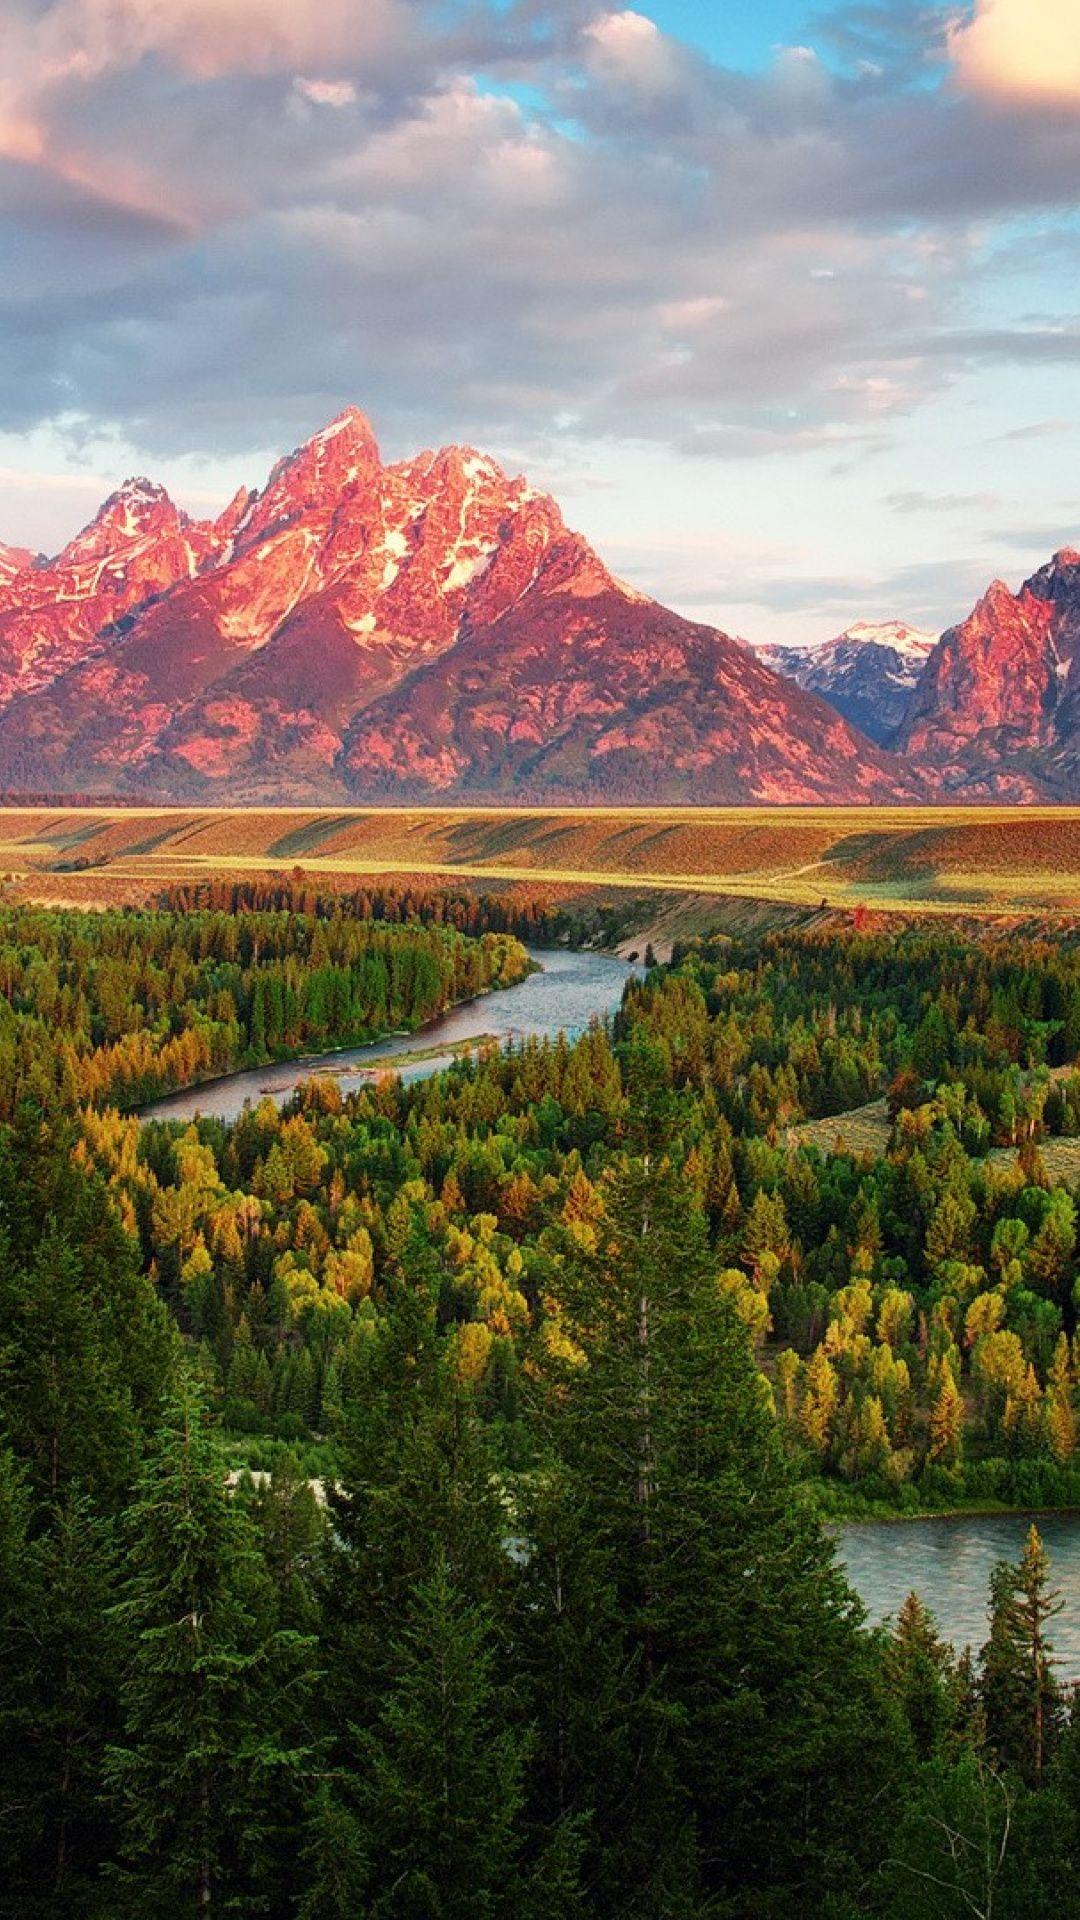 Downloadwallpaper Mount Scenery, Nature Reserve, National Park